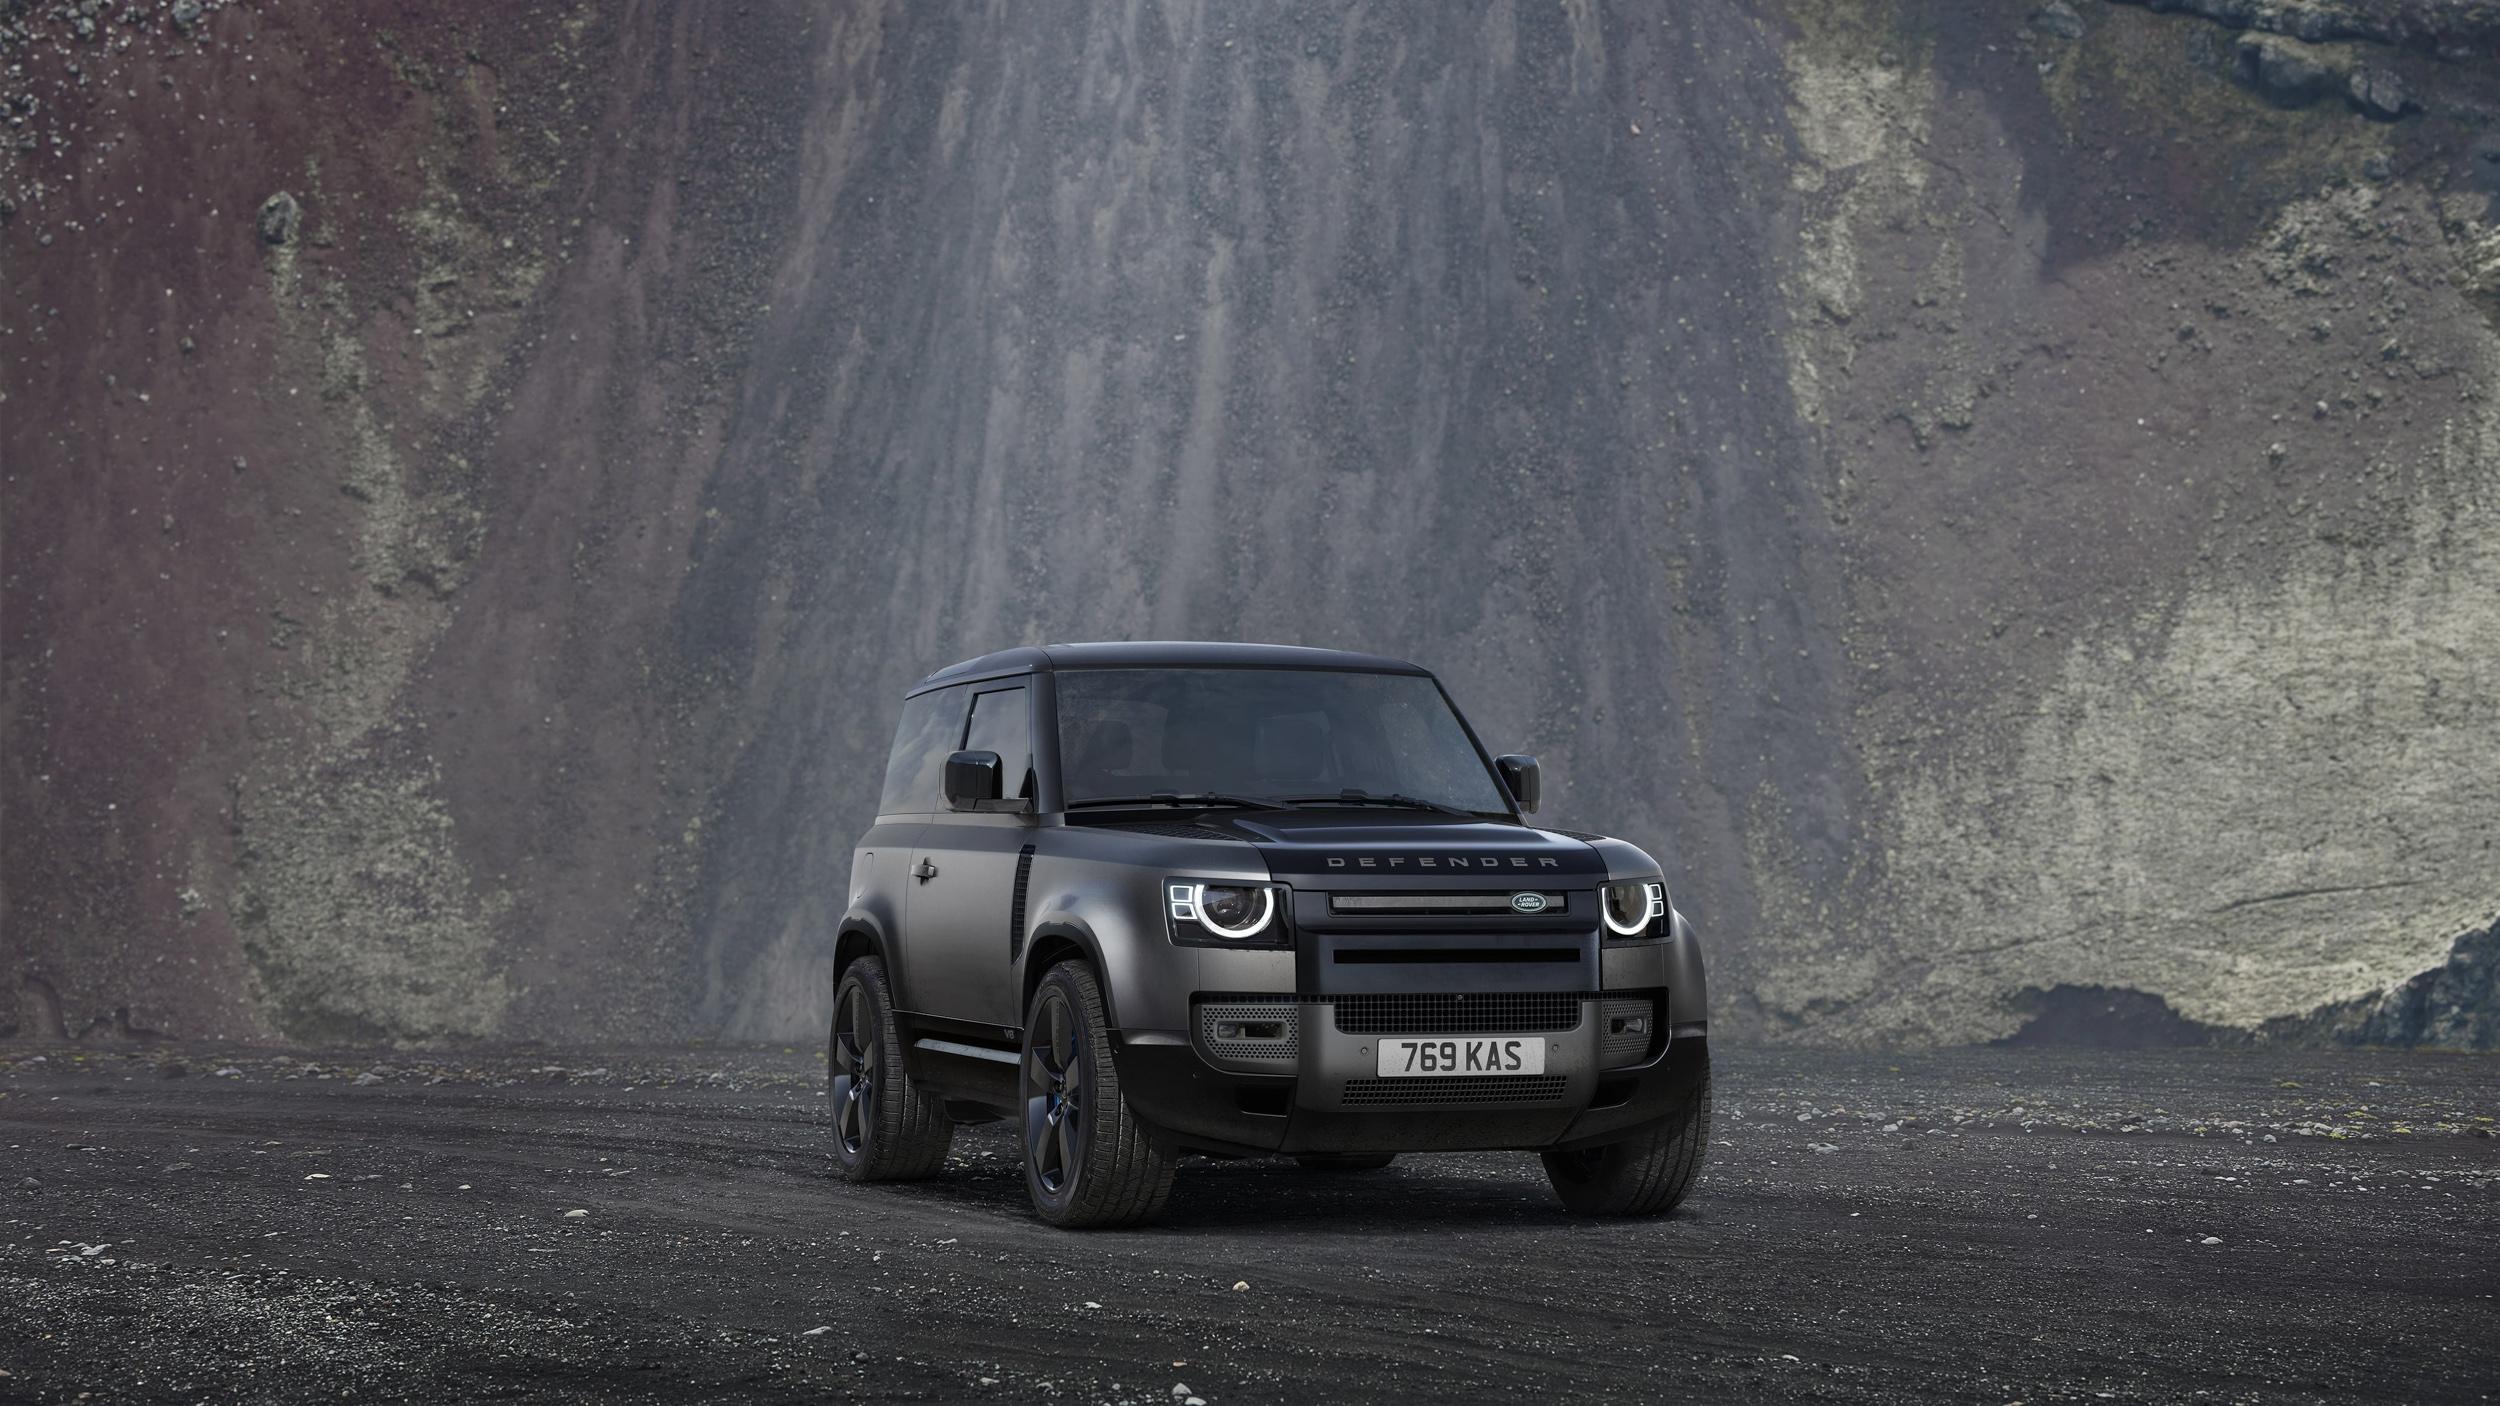 新台幣 650 萬元!Land Rover Defender 90 V8 特仕版 2023 年式限量預接單